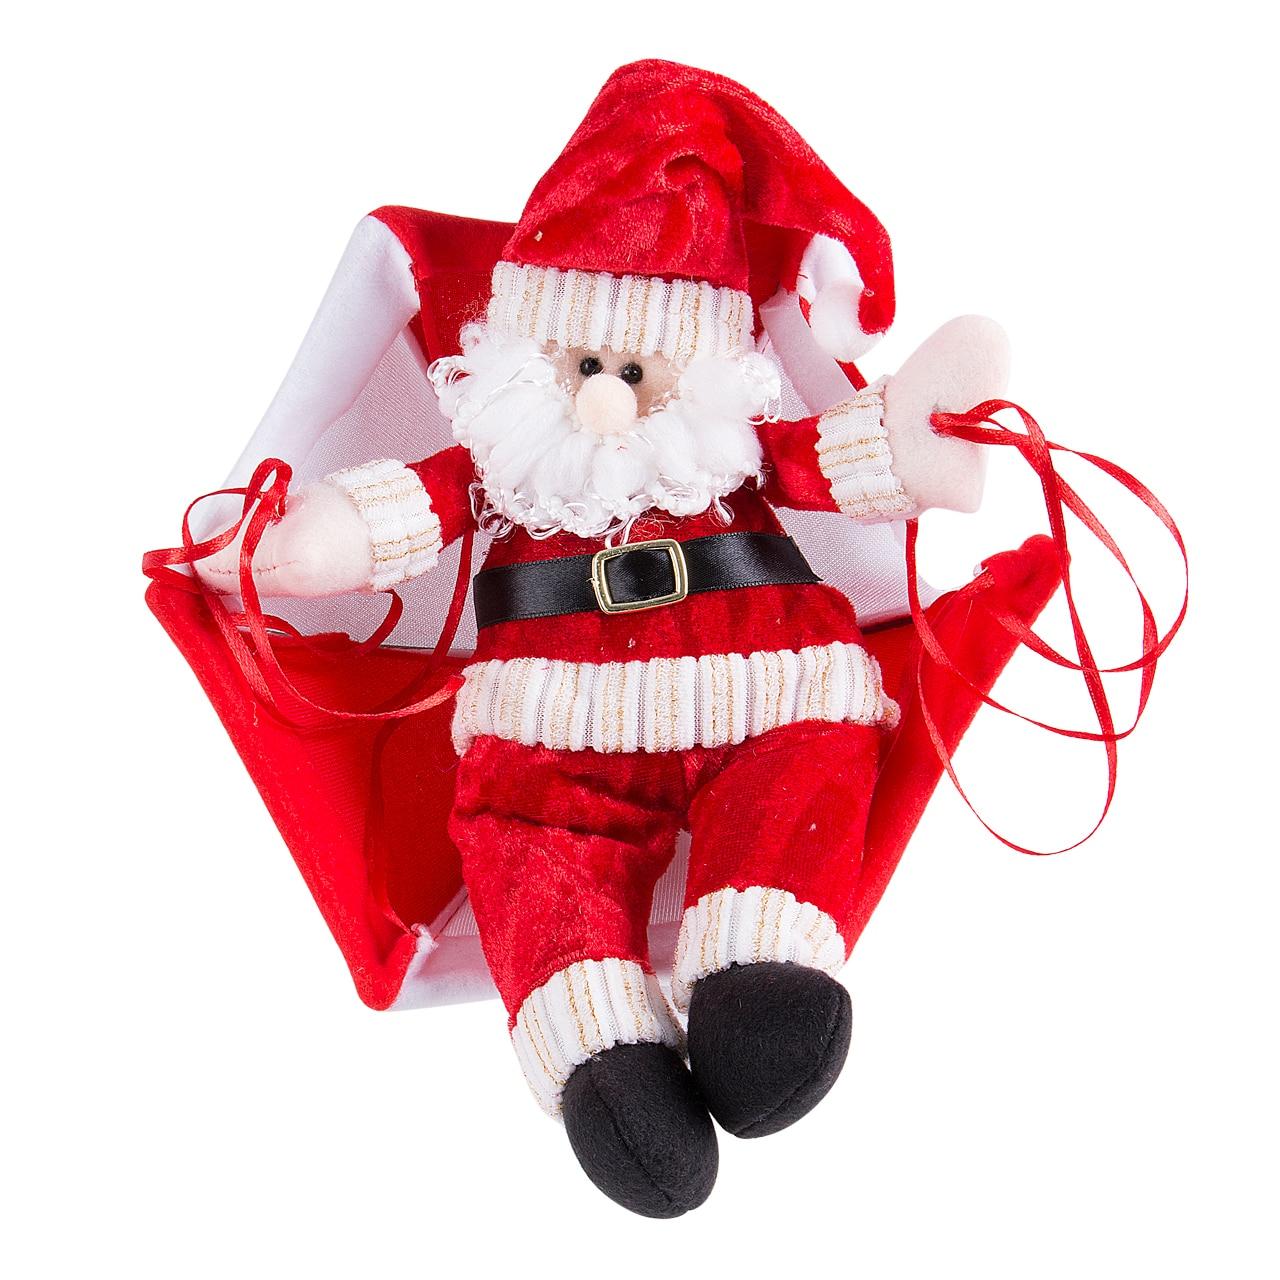 Christmas tree hanging decorations new parachute santa claus snowman - Christmas Tree Hanging Decoration Parachute Snowman Santa Claus Ornaments Xmas M China Mainland